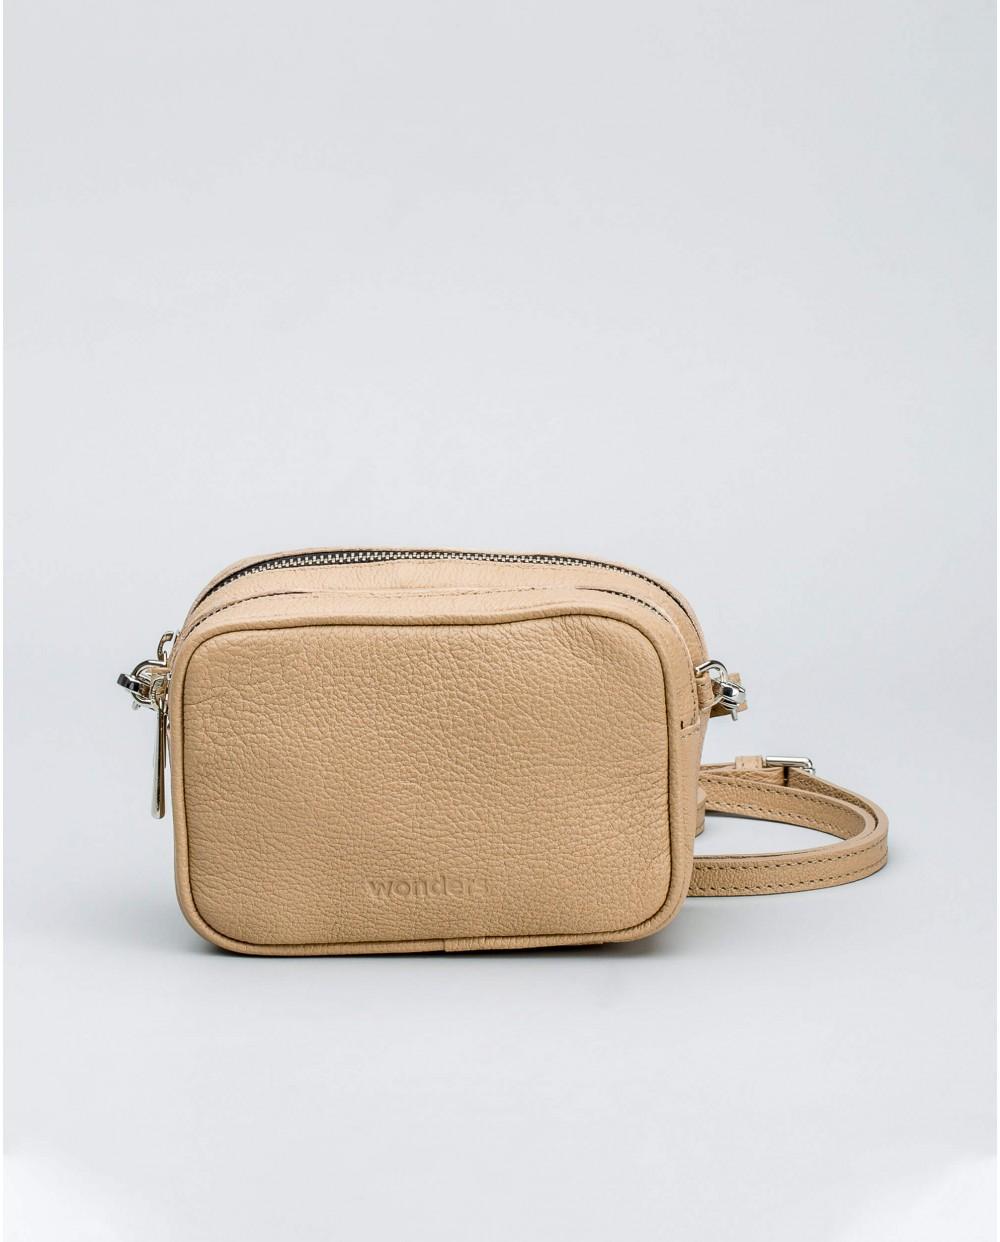 Wonders-Outlet-Mini handbag in pebble leather